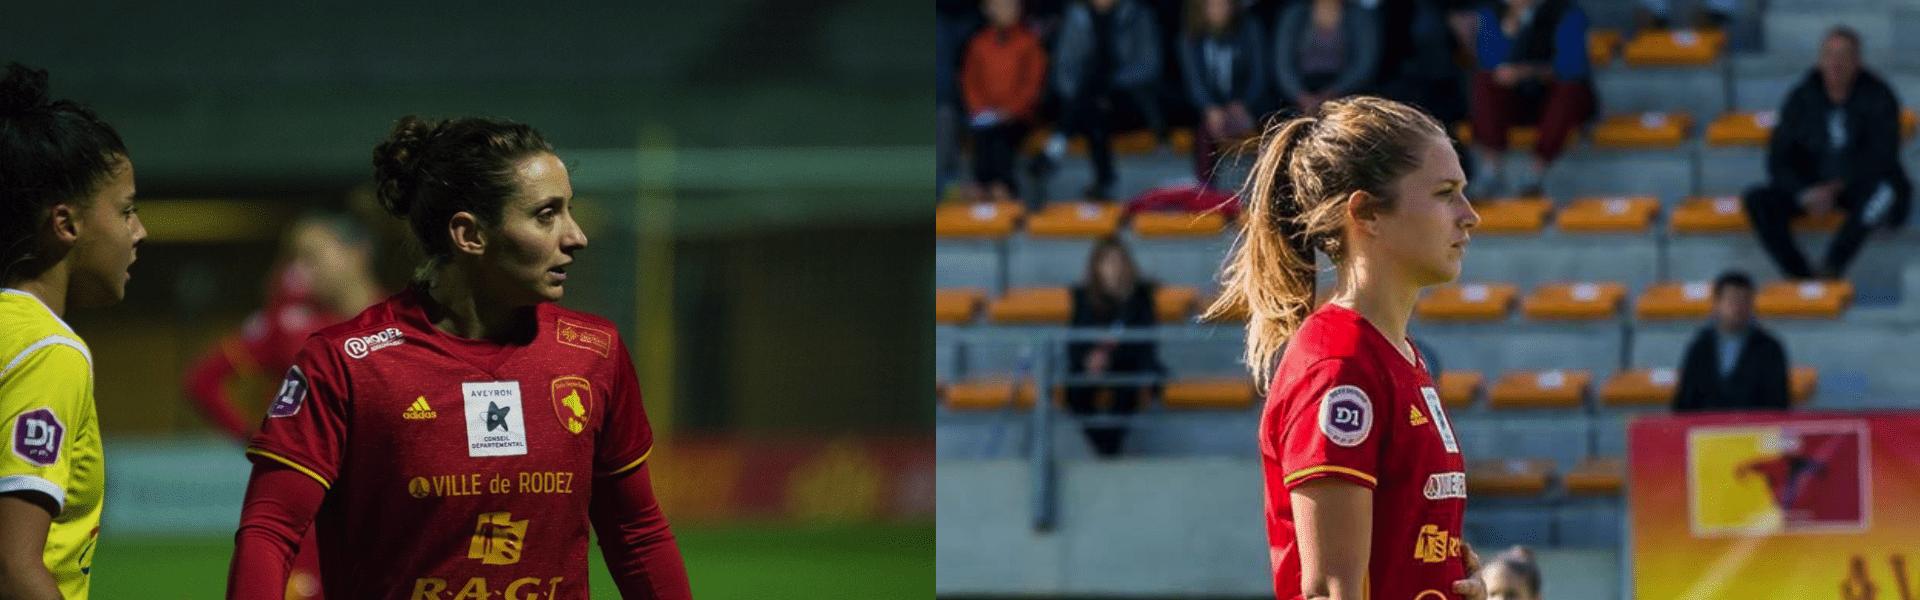 18 ze journée :dimanche 1 avril :14 H  :Rafettes vs Lille Peruzzetto-Ginestet